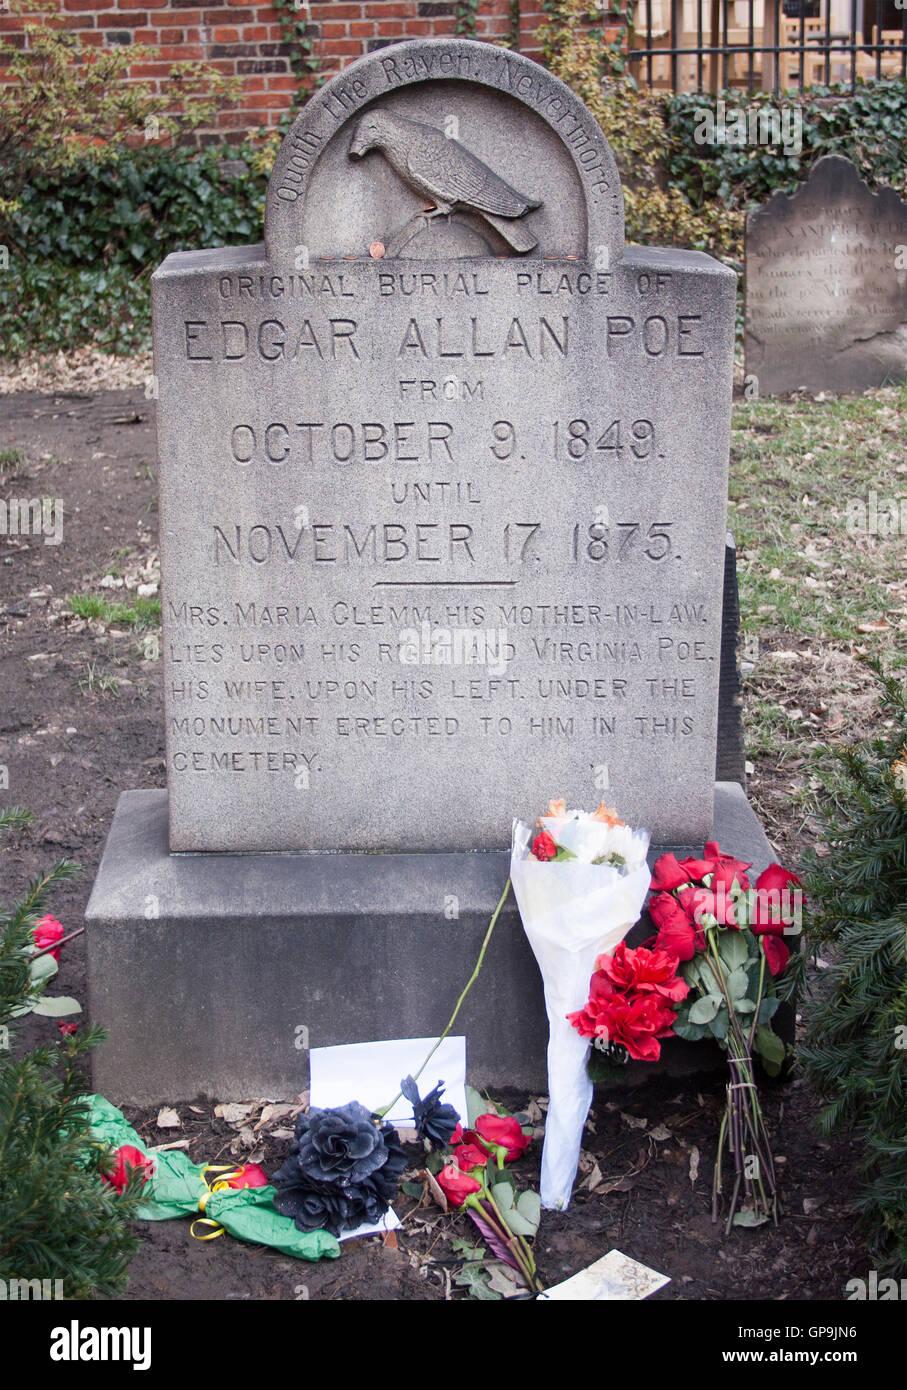 Edgar Allen Poe Grave in Baltimore Maryland - Stock Image